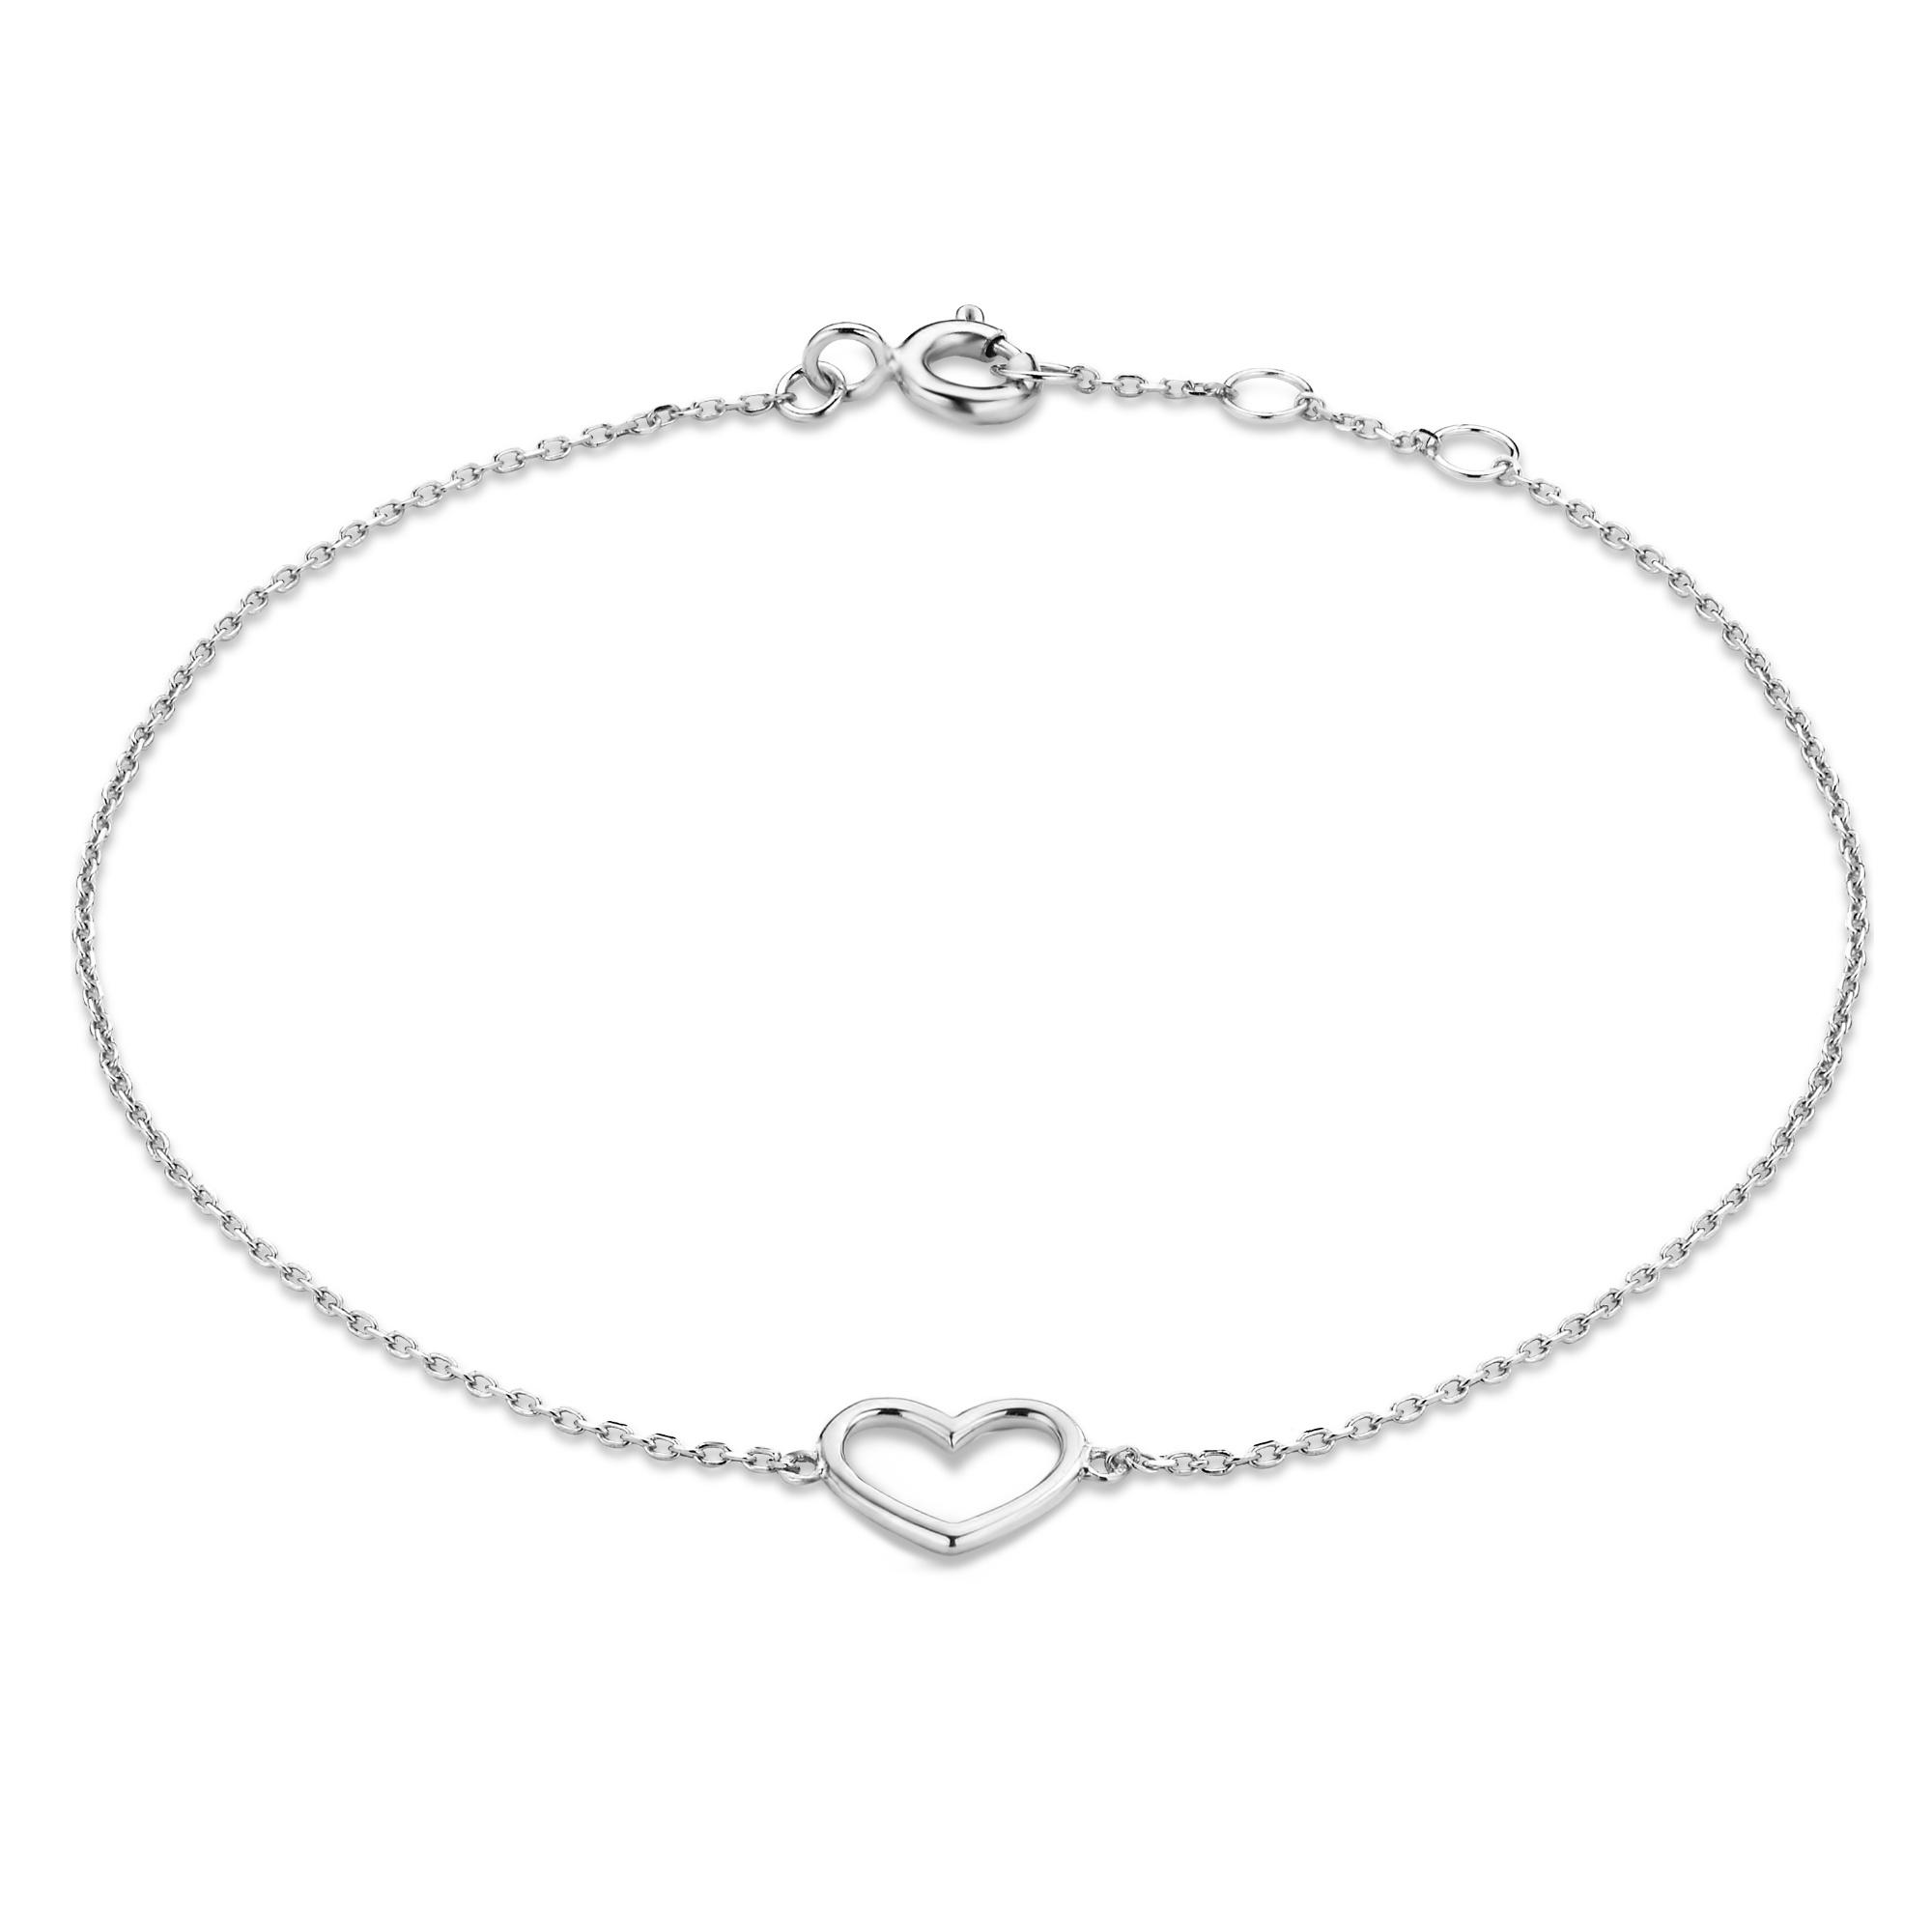 Isabel Bernard Saint Germain Alix 14 karaat witgouden armband met hartje